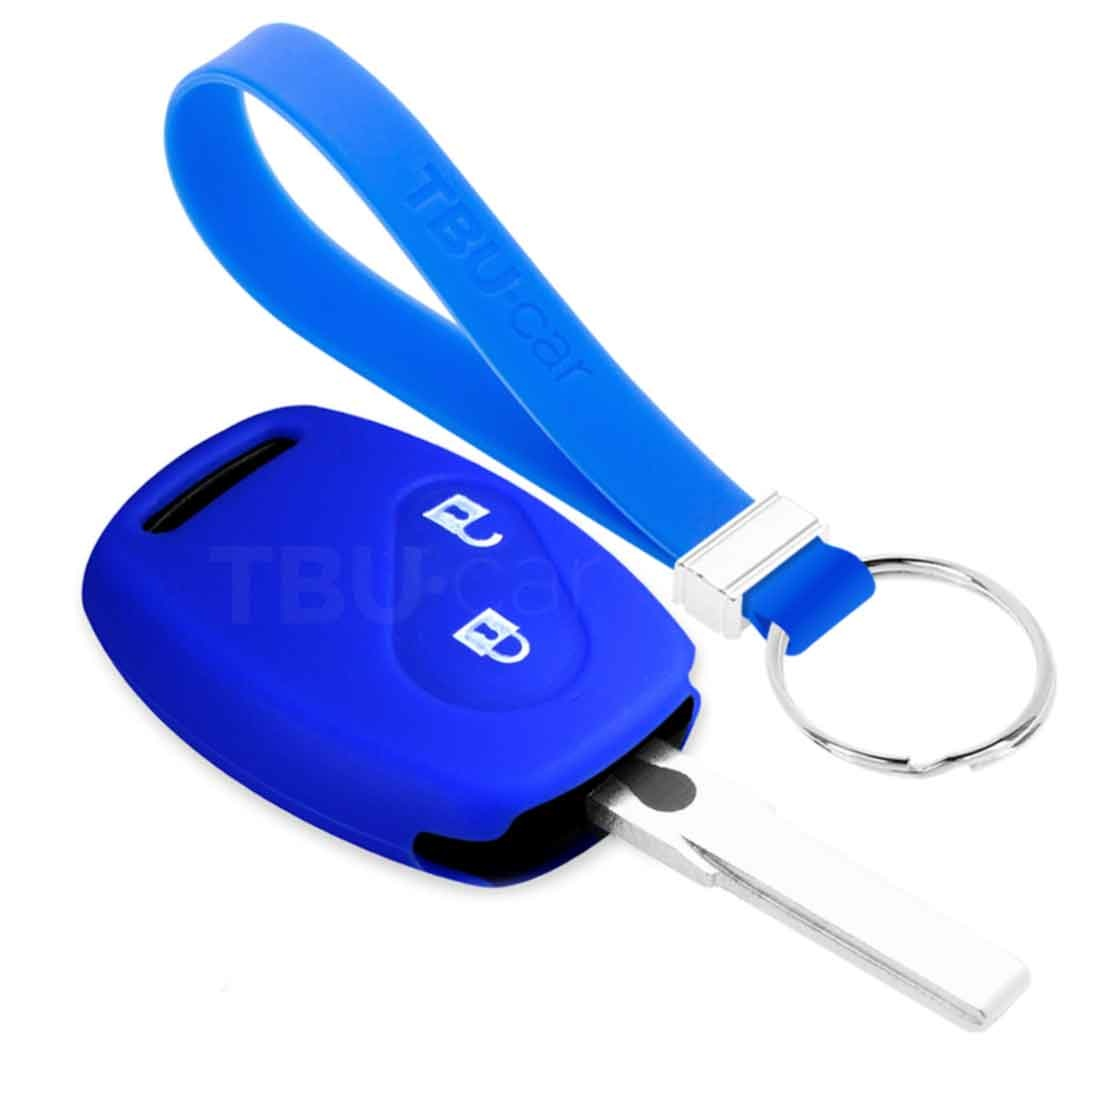 TBU car TBU car Autoschlüssel Hülle kompatibel mit Honda 2 Tasten - Schutzhülle aus Silikon - Auto Schlüsselhülle Cover in Blau